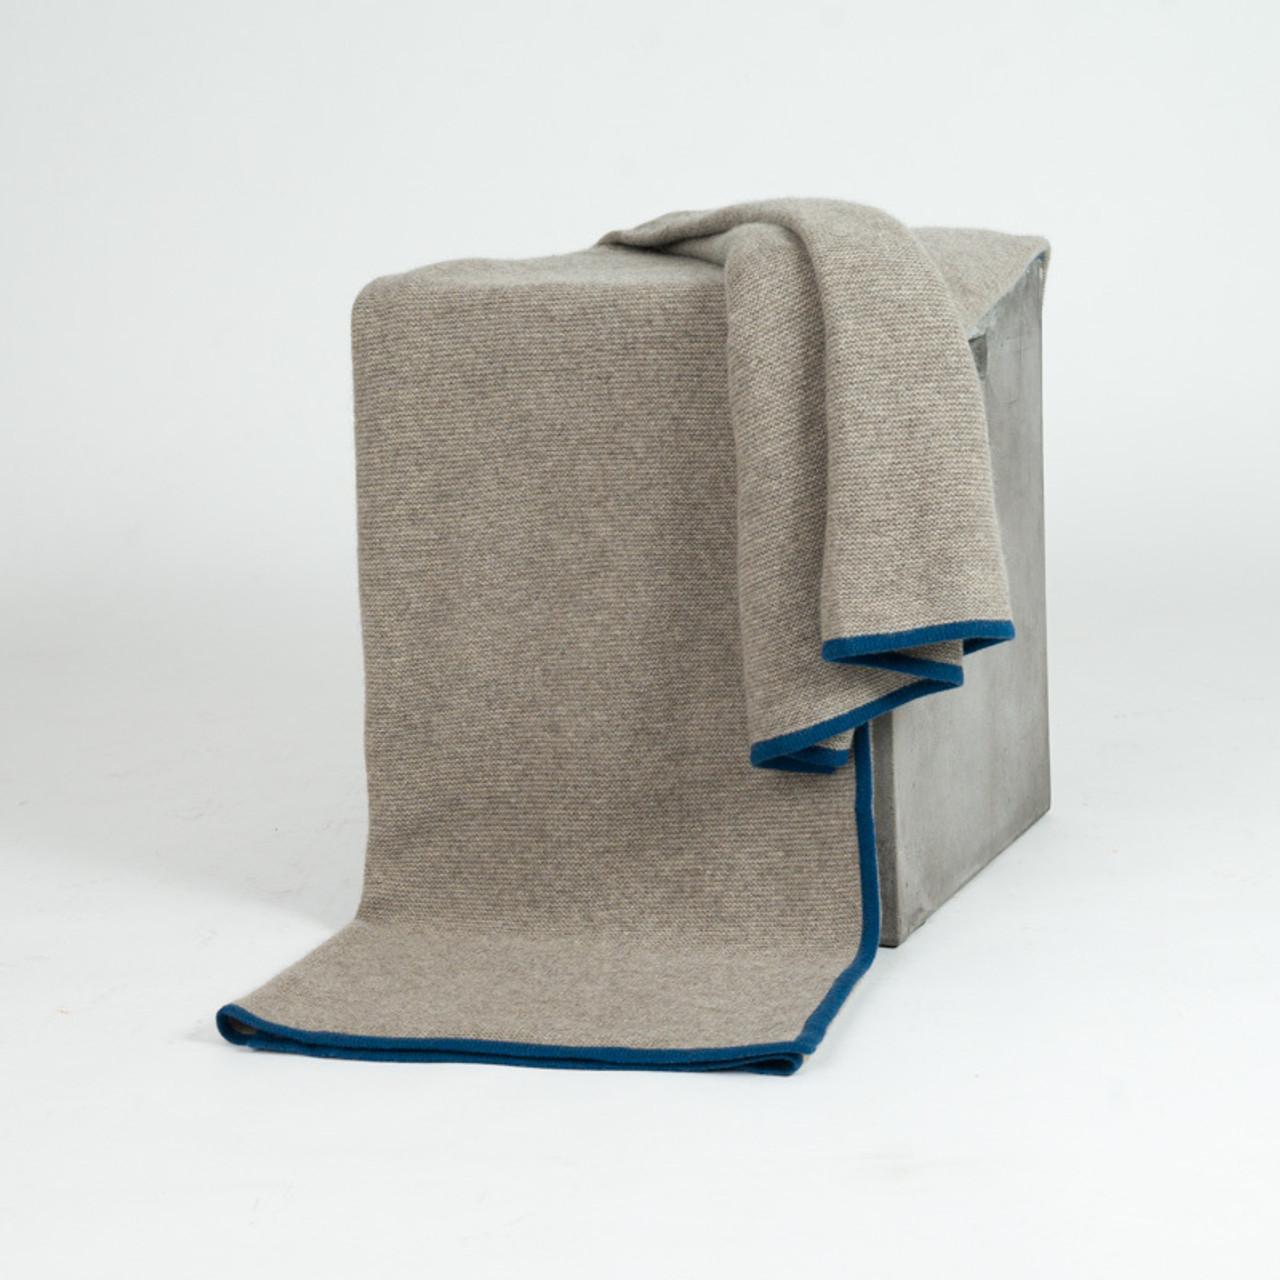 Platinum & Mineral Blue Purl Knit Yak Down Throw